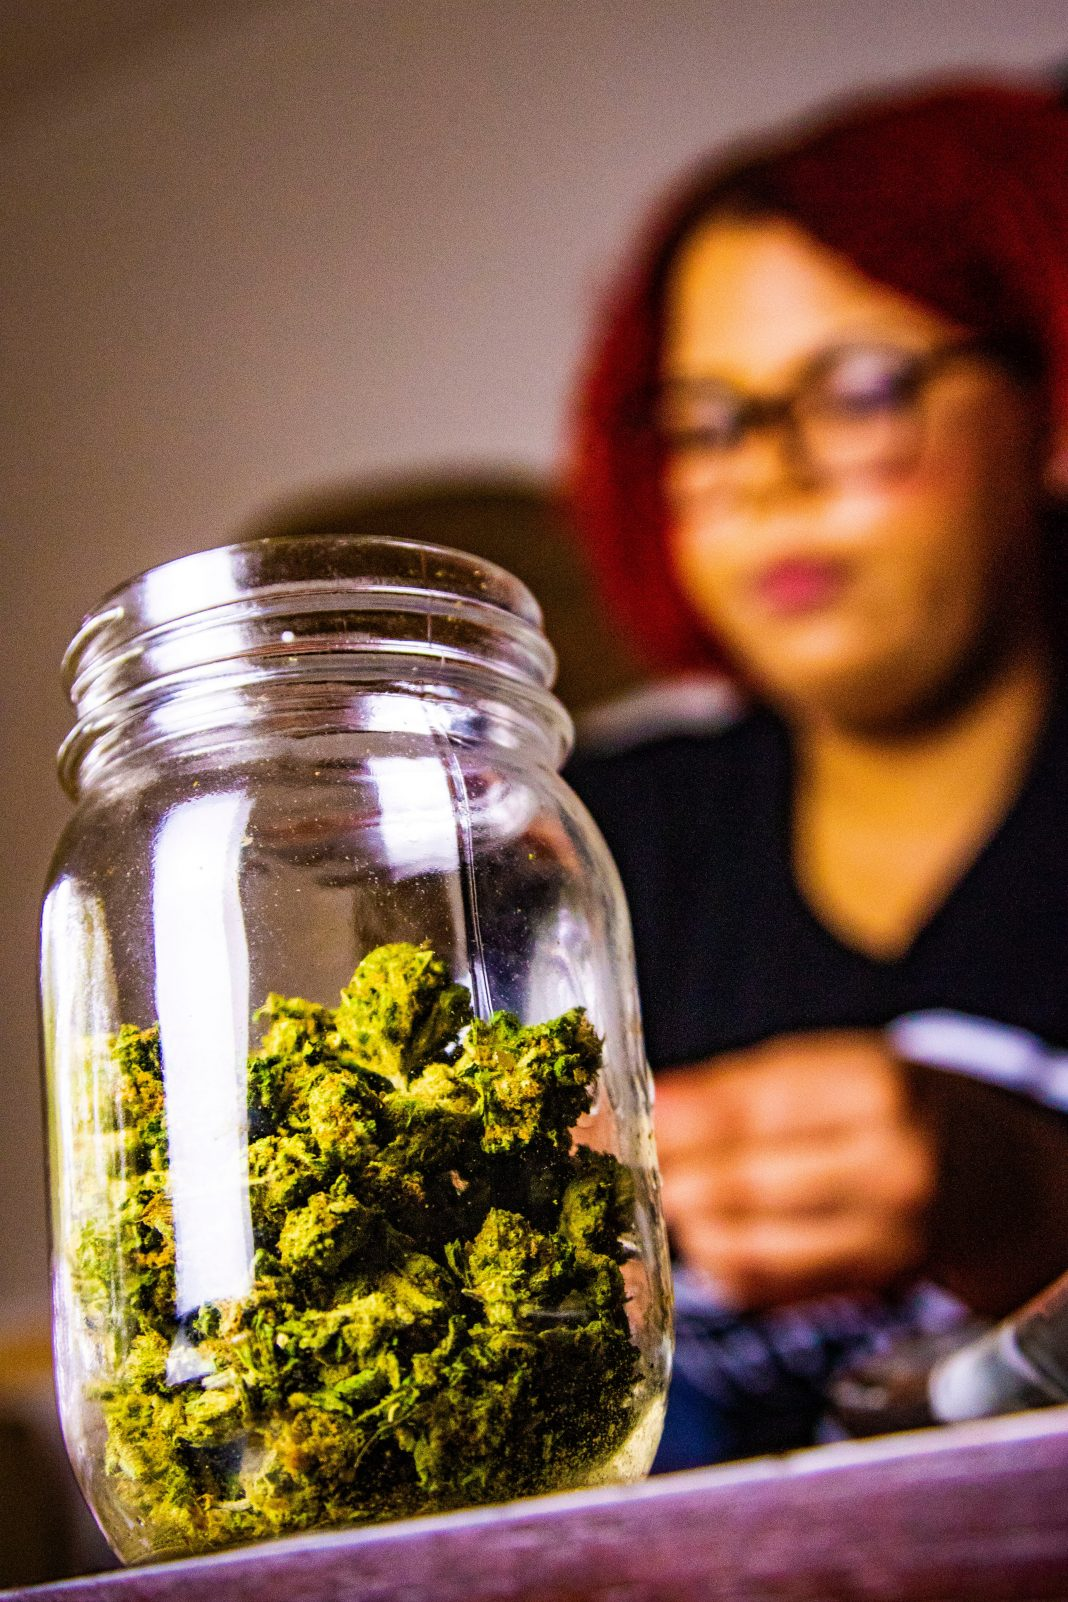 Female Viagra Now Exists, Thanks To Cannabis ⋆ Dine Magazine